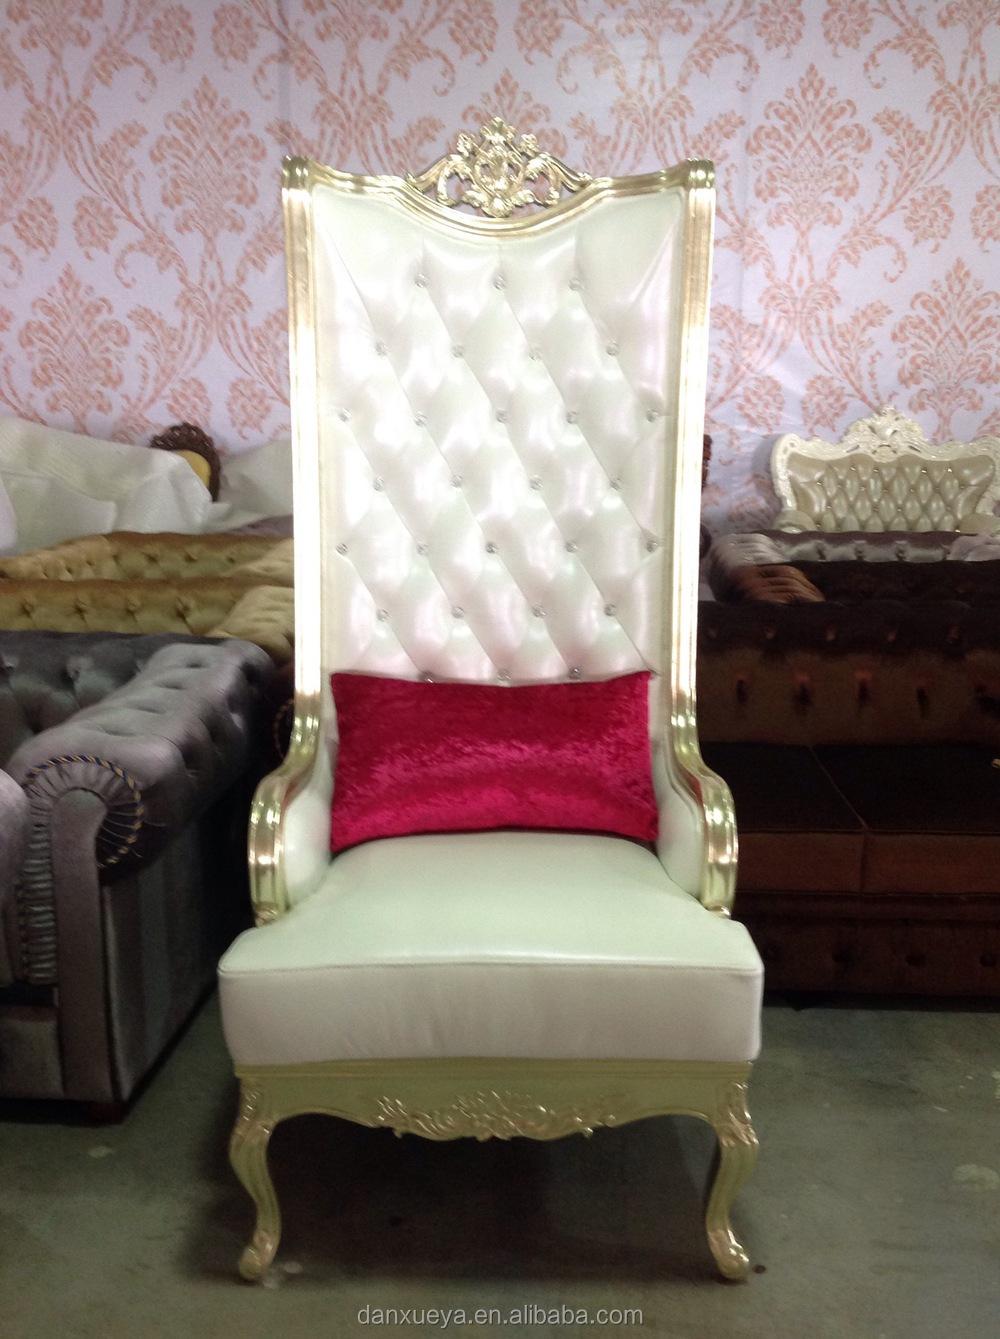 danxueya saloon style high back used pedicure chair pedicure salon furniture